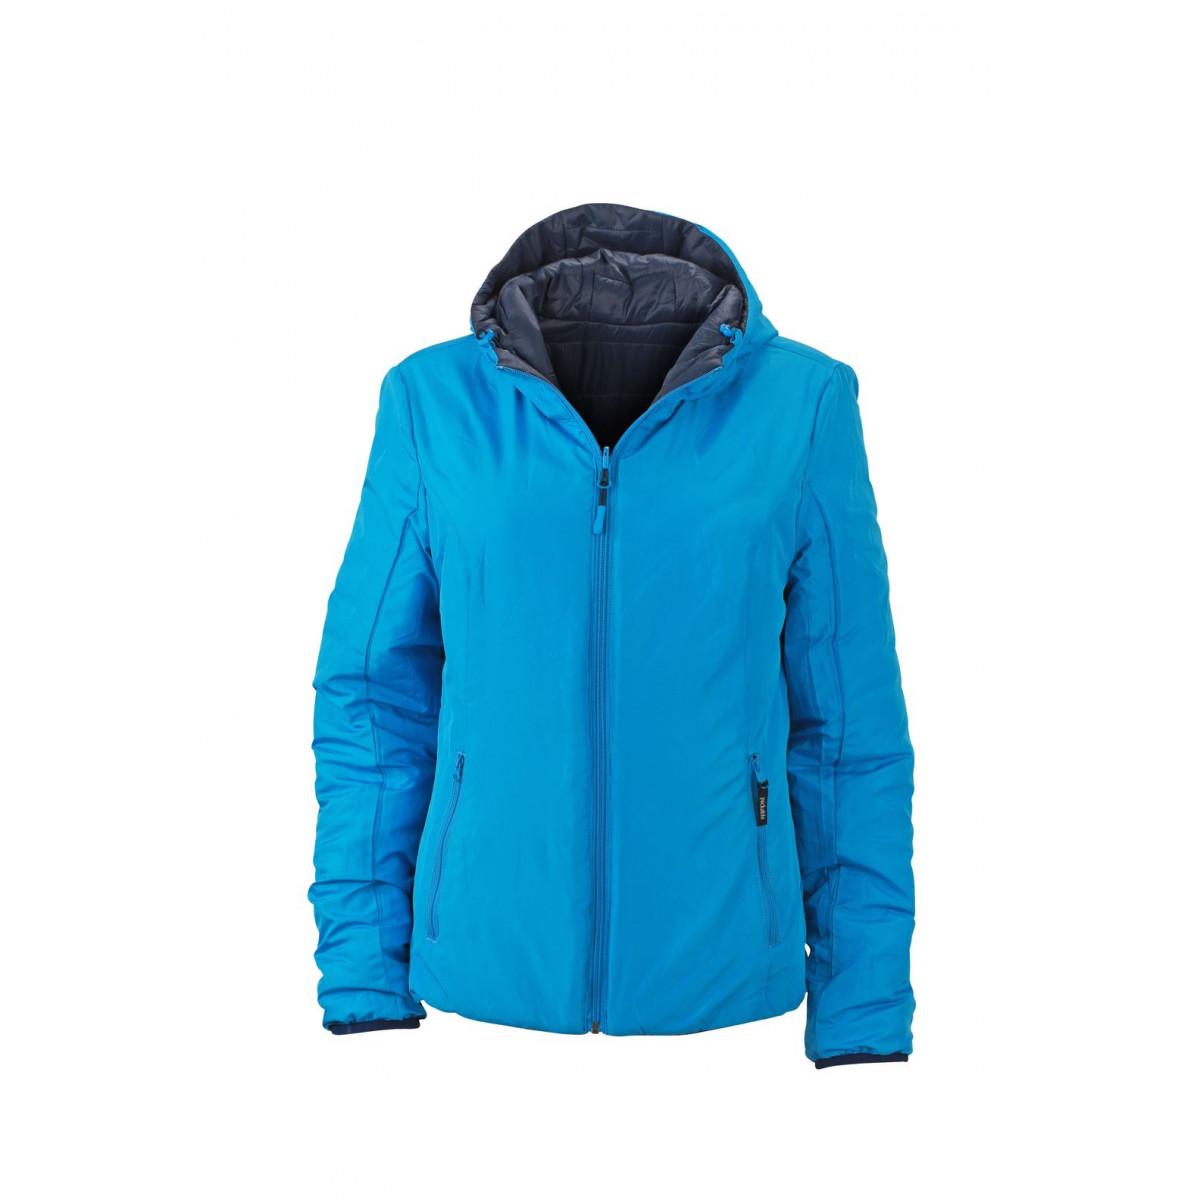 Куртка женская JN1091 Ladies Lightweight Jacket - Темно-синий/Аква